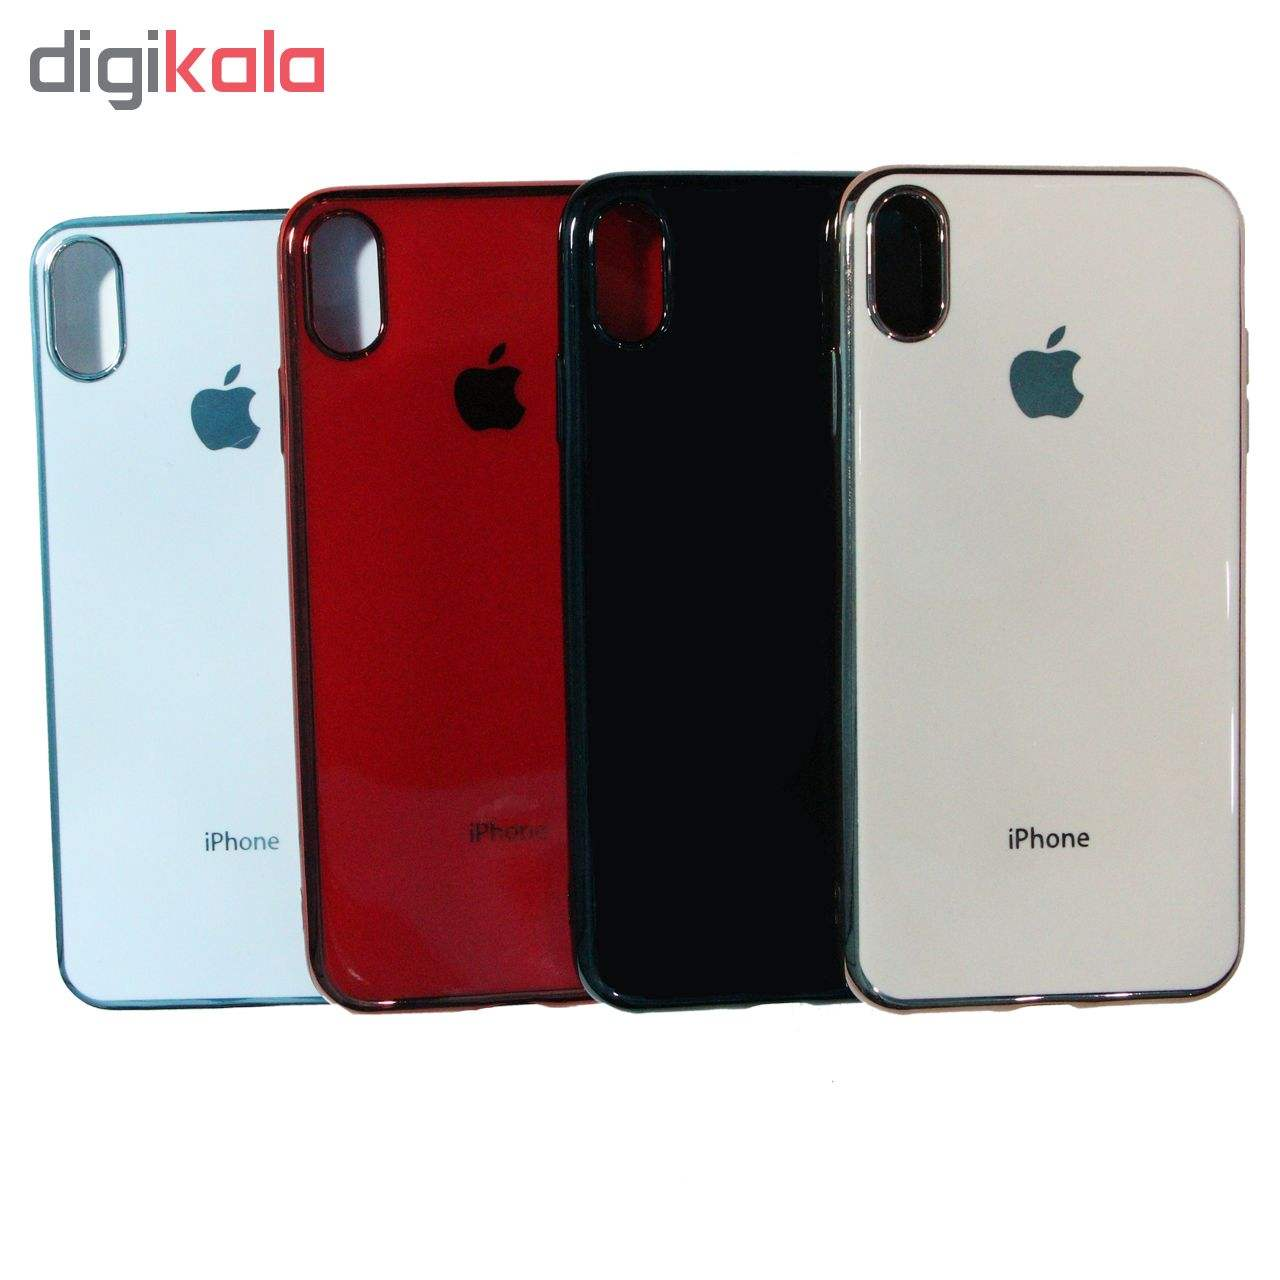 کاور  مدل A0 مناسب برای گوشی موبایل اپل iphone xs max main 1 2